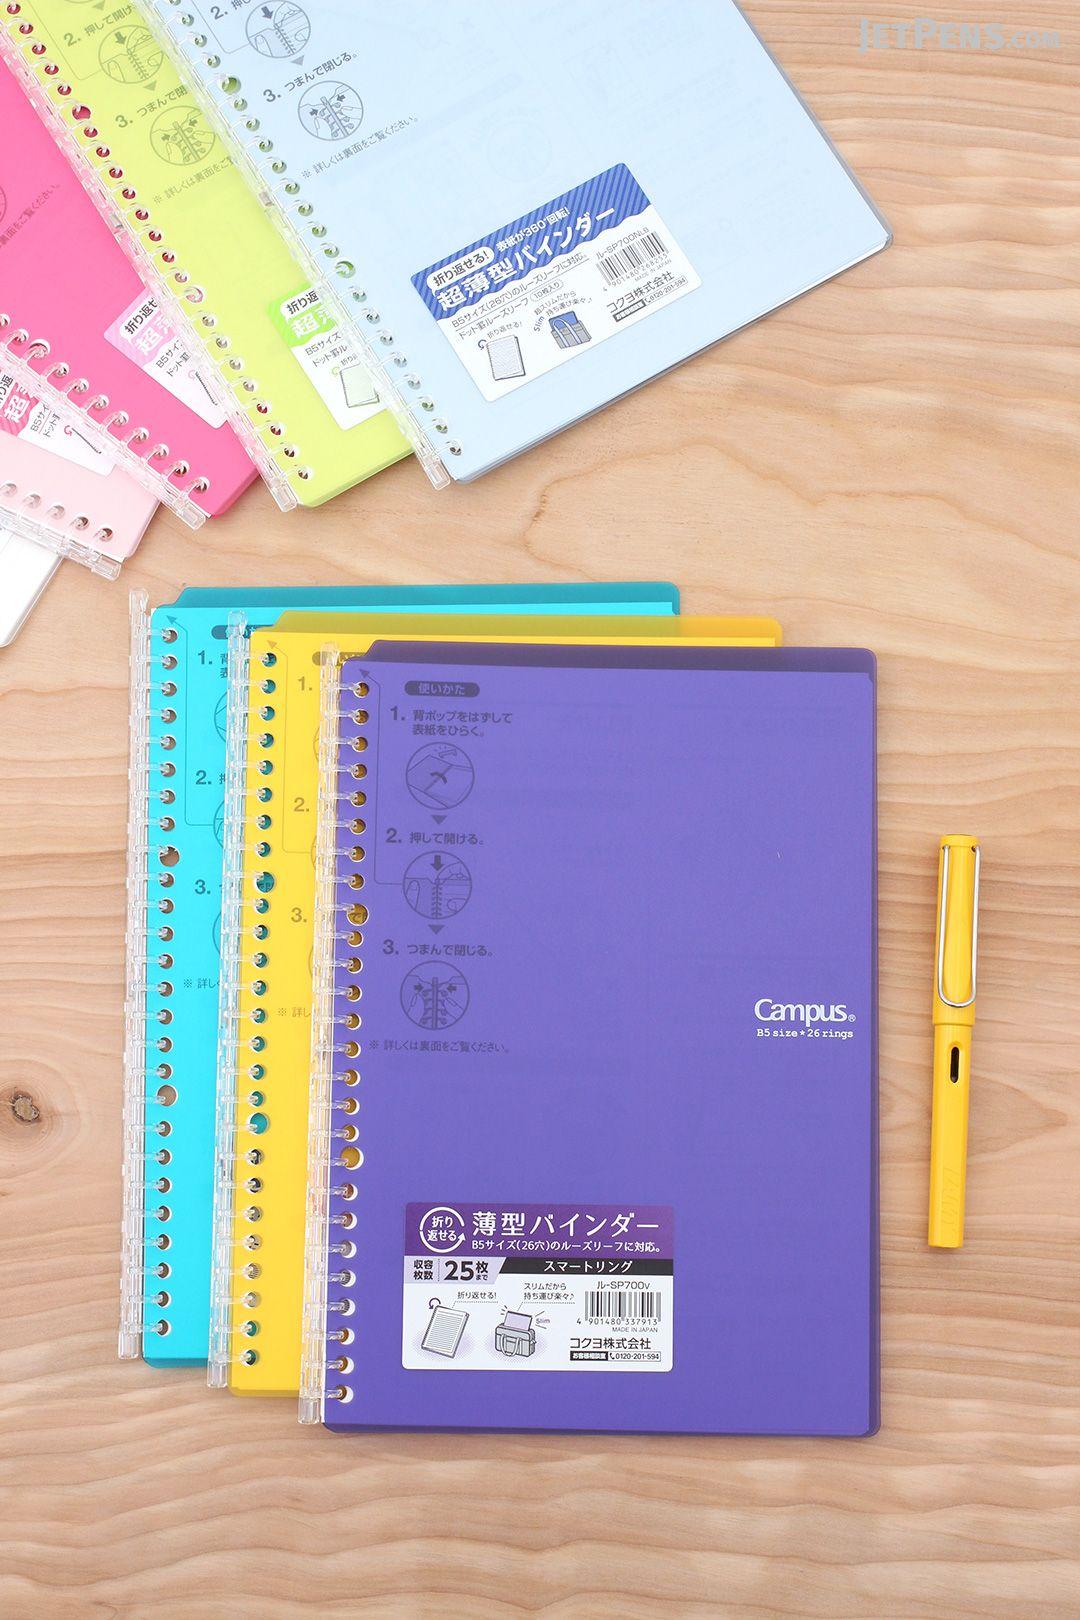 Useful New Kokuyo Biz Edge Title 5mm Grid Ruler Soft Ring Note Book Black B5 A5 Big Clearance Sale